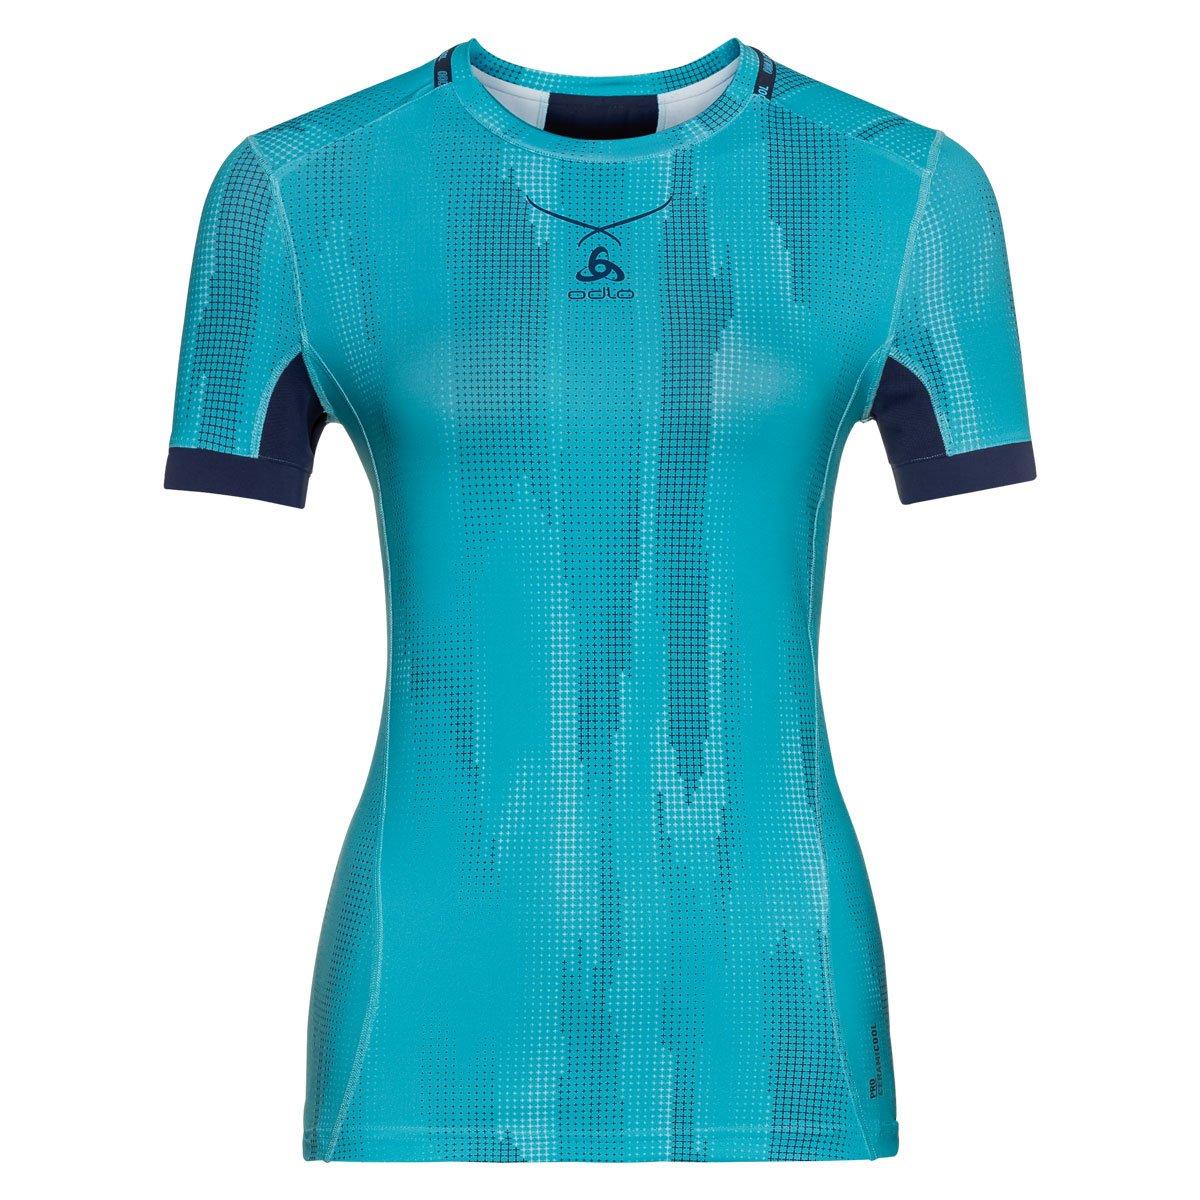 ODLO Women's Shirt S/S Crew Neck Ceramicool Pro Print Underwear 160121